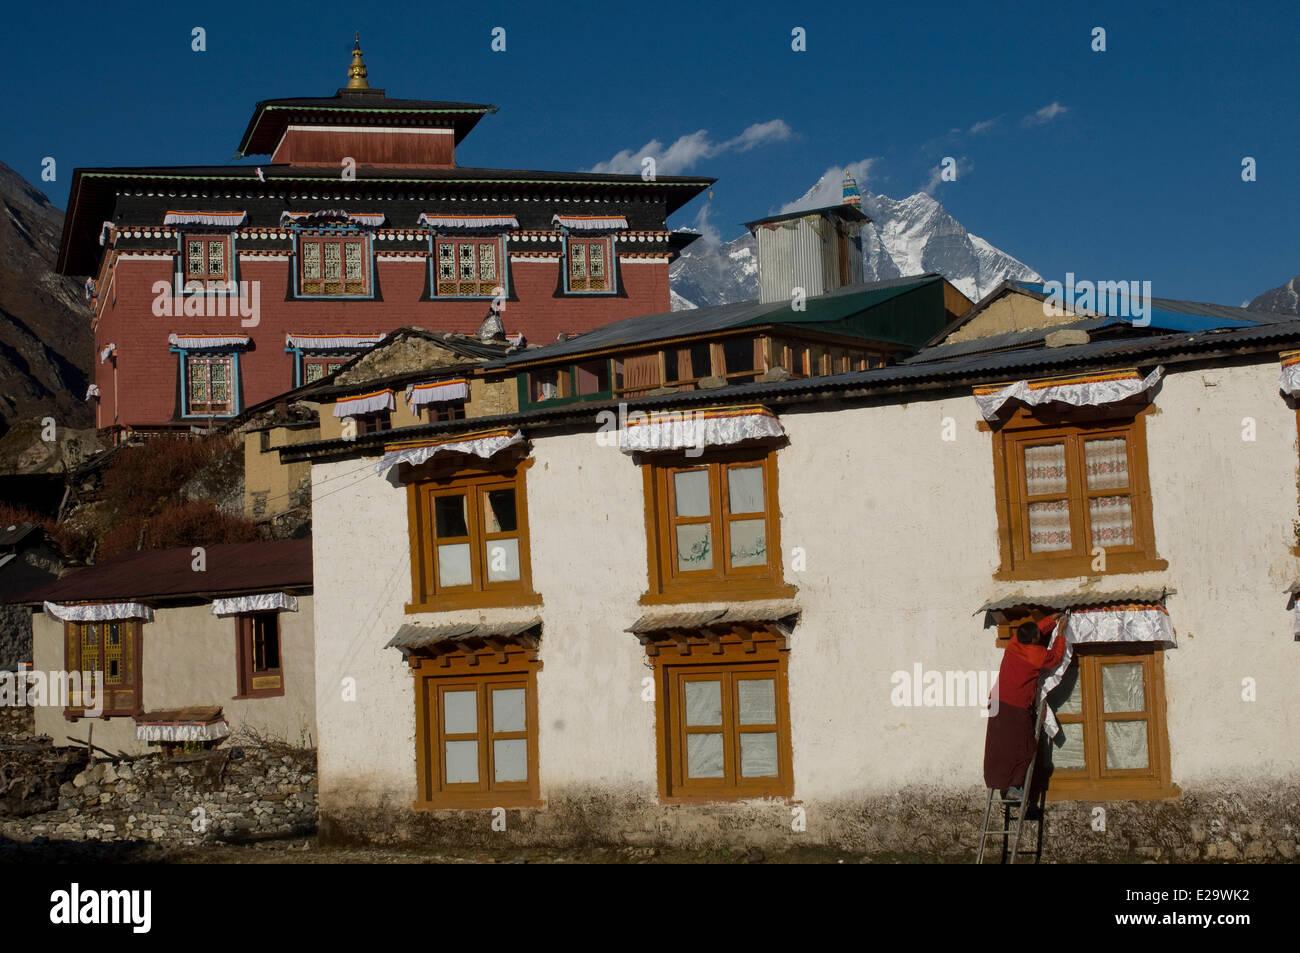 Nepal, Sagarmatha Zone, Khumbu Region, trek of the Everest Base Camp, Tengboche monastery - Stock Image